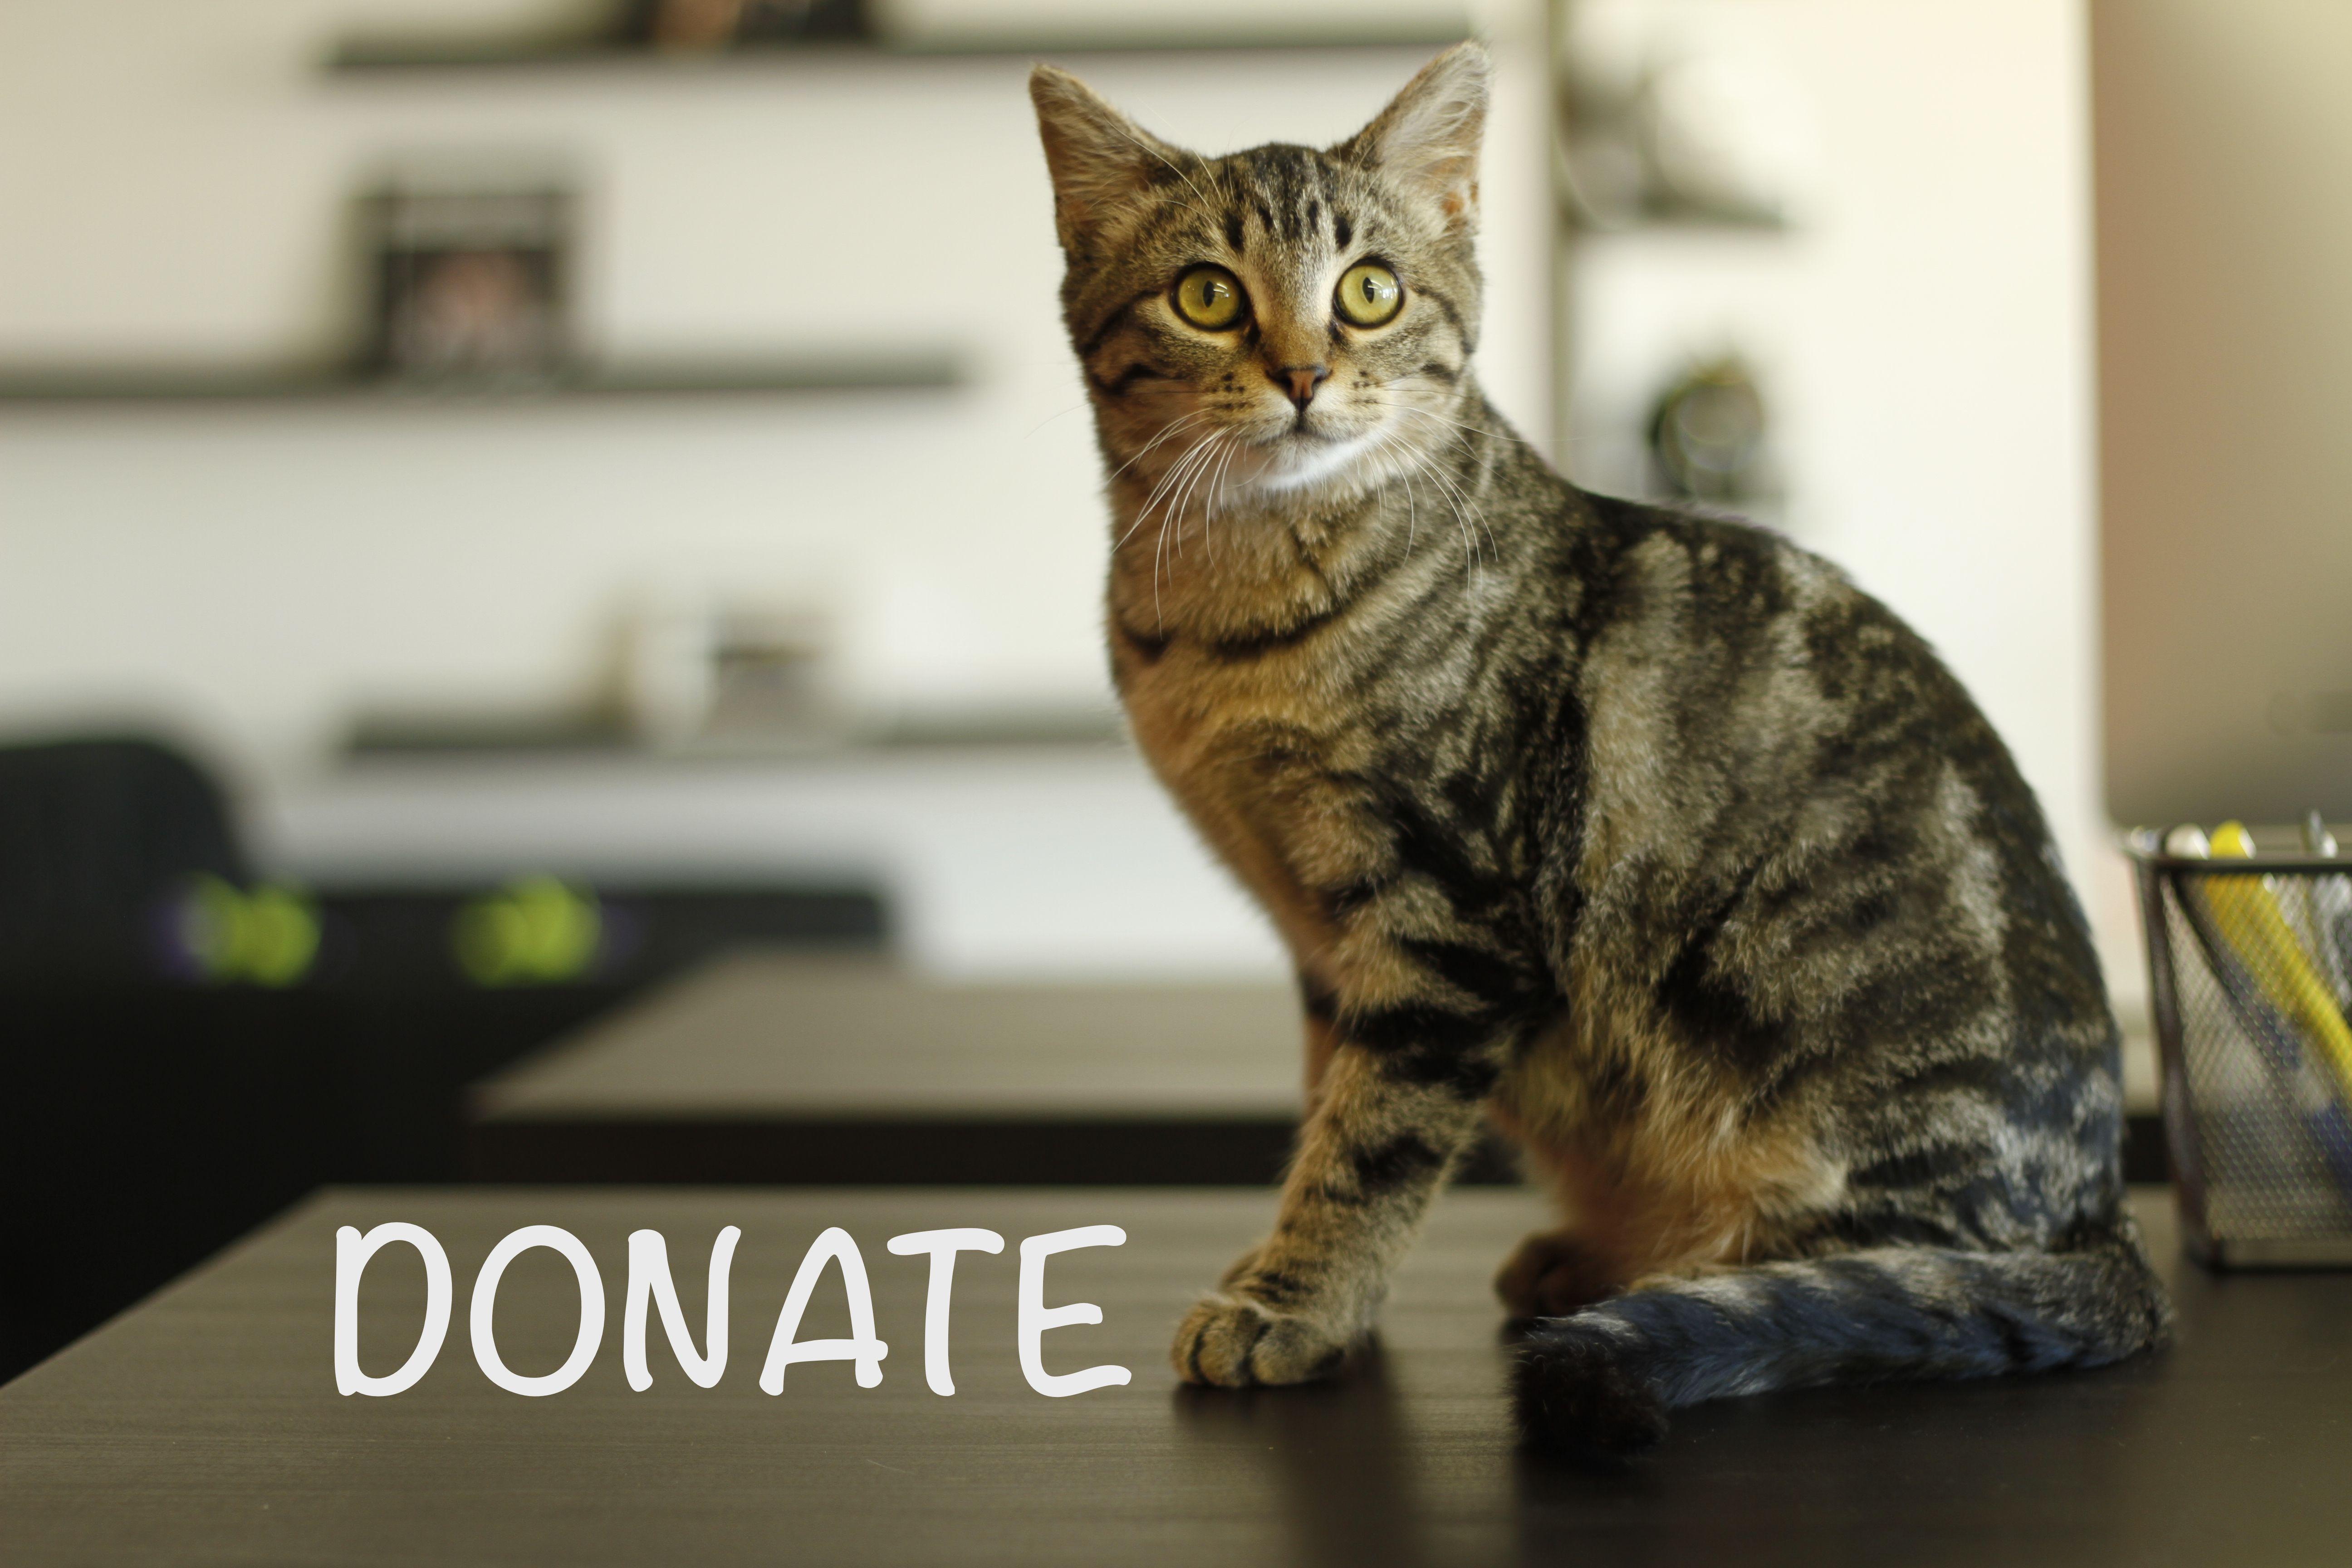 Donate Animals, Kitten rescue, Cat adoption